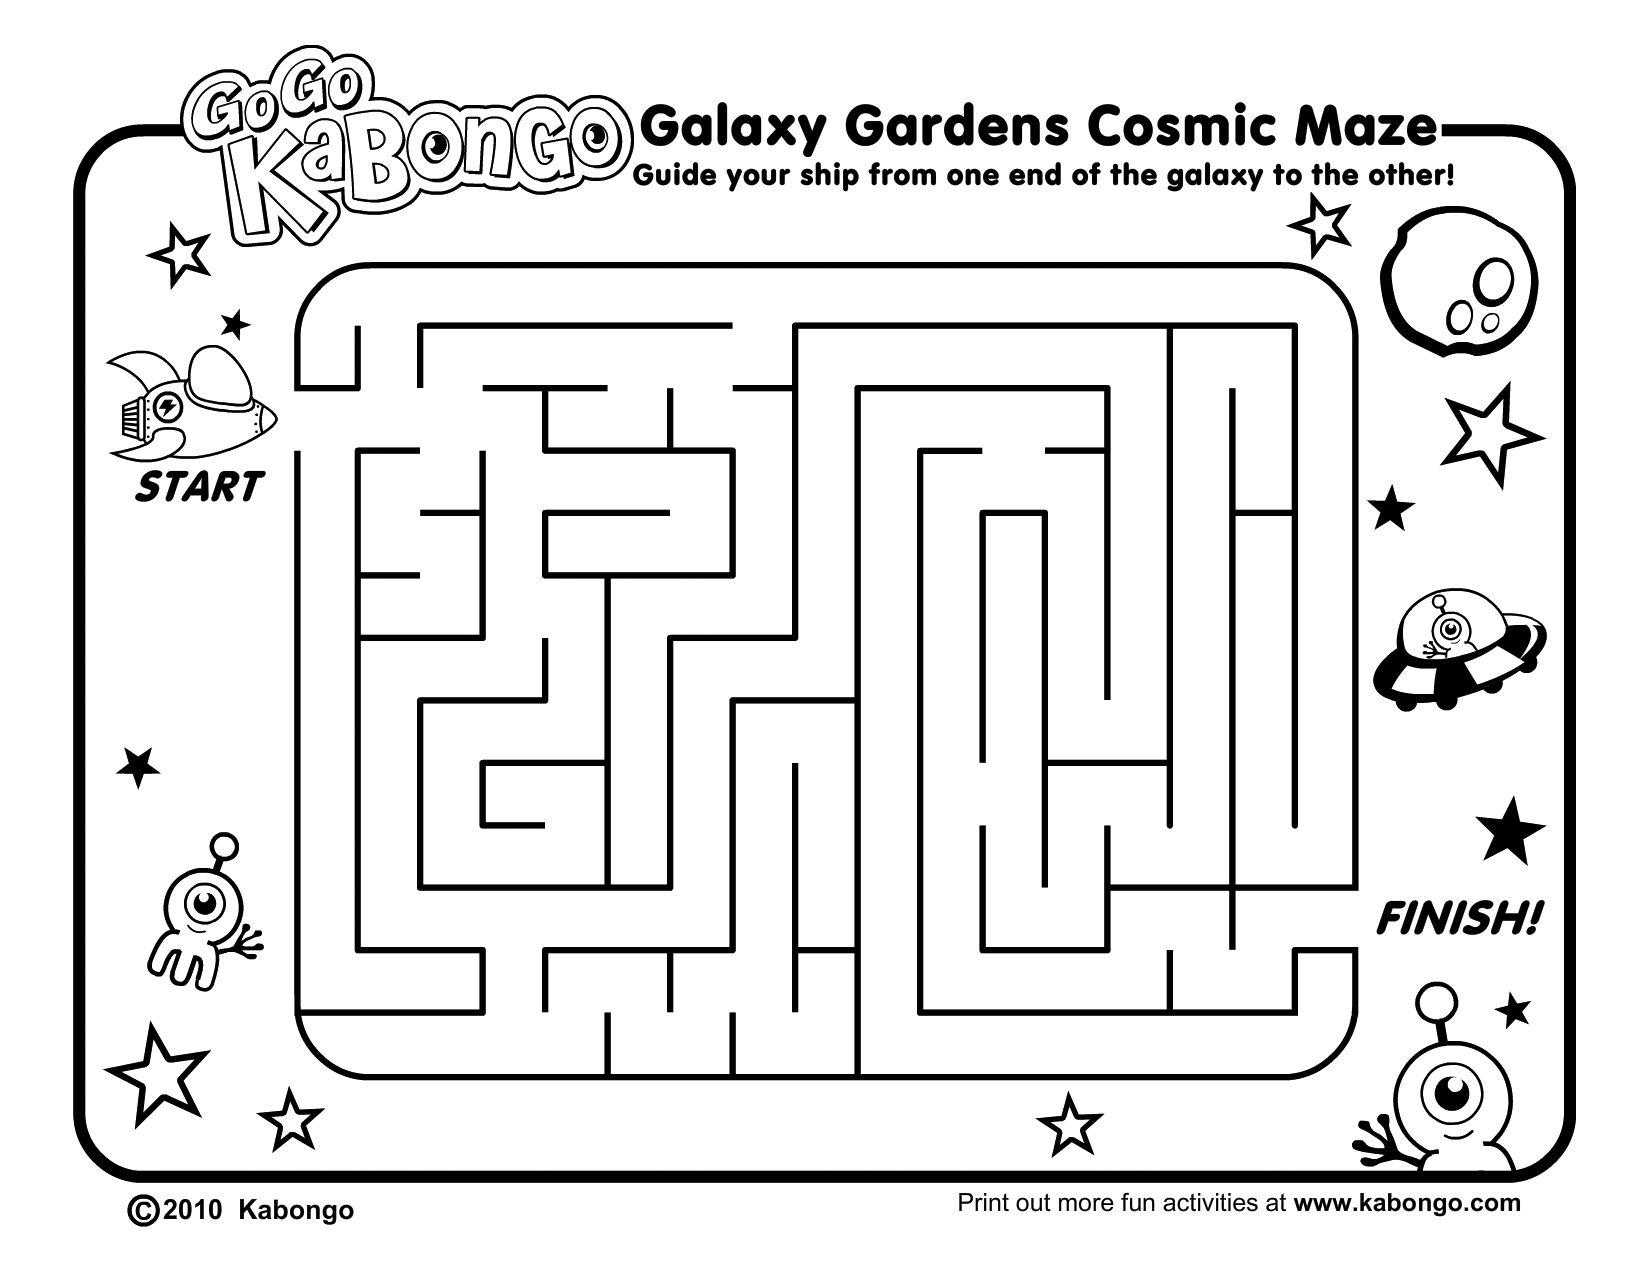 Kabongo Galaxygardens Maze 1 650 1 275 Pixels